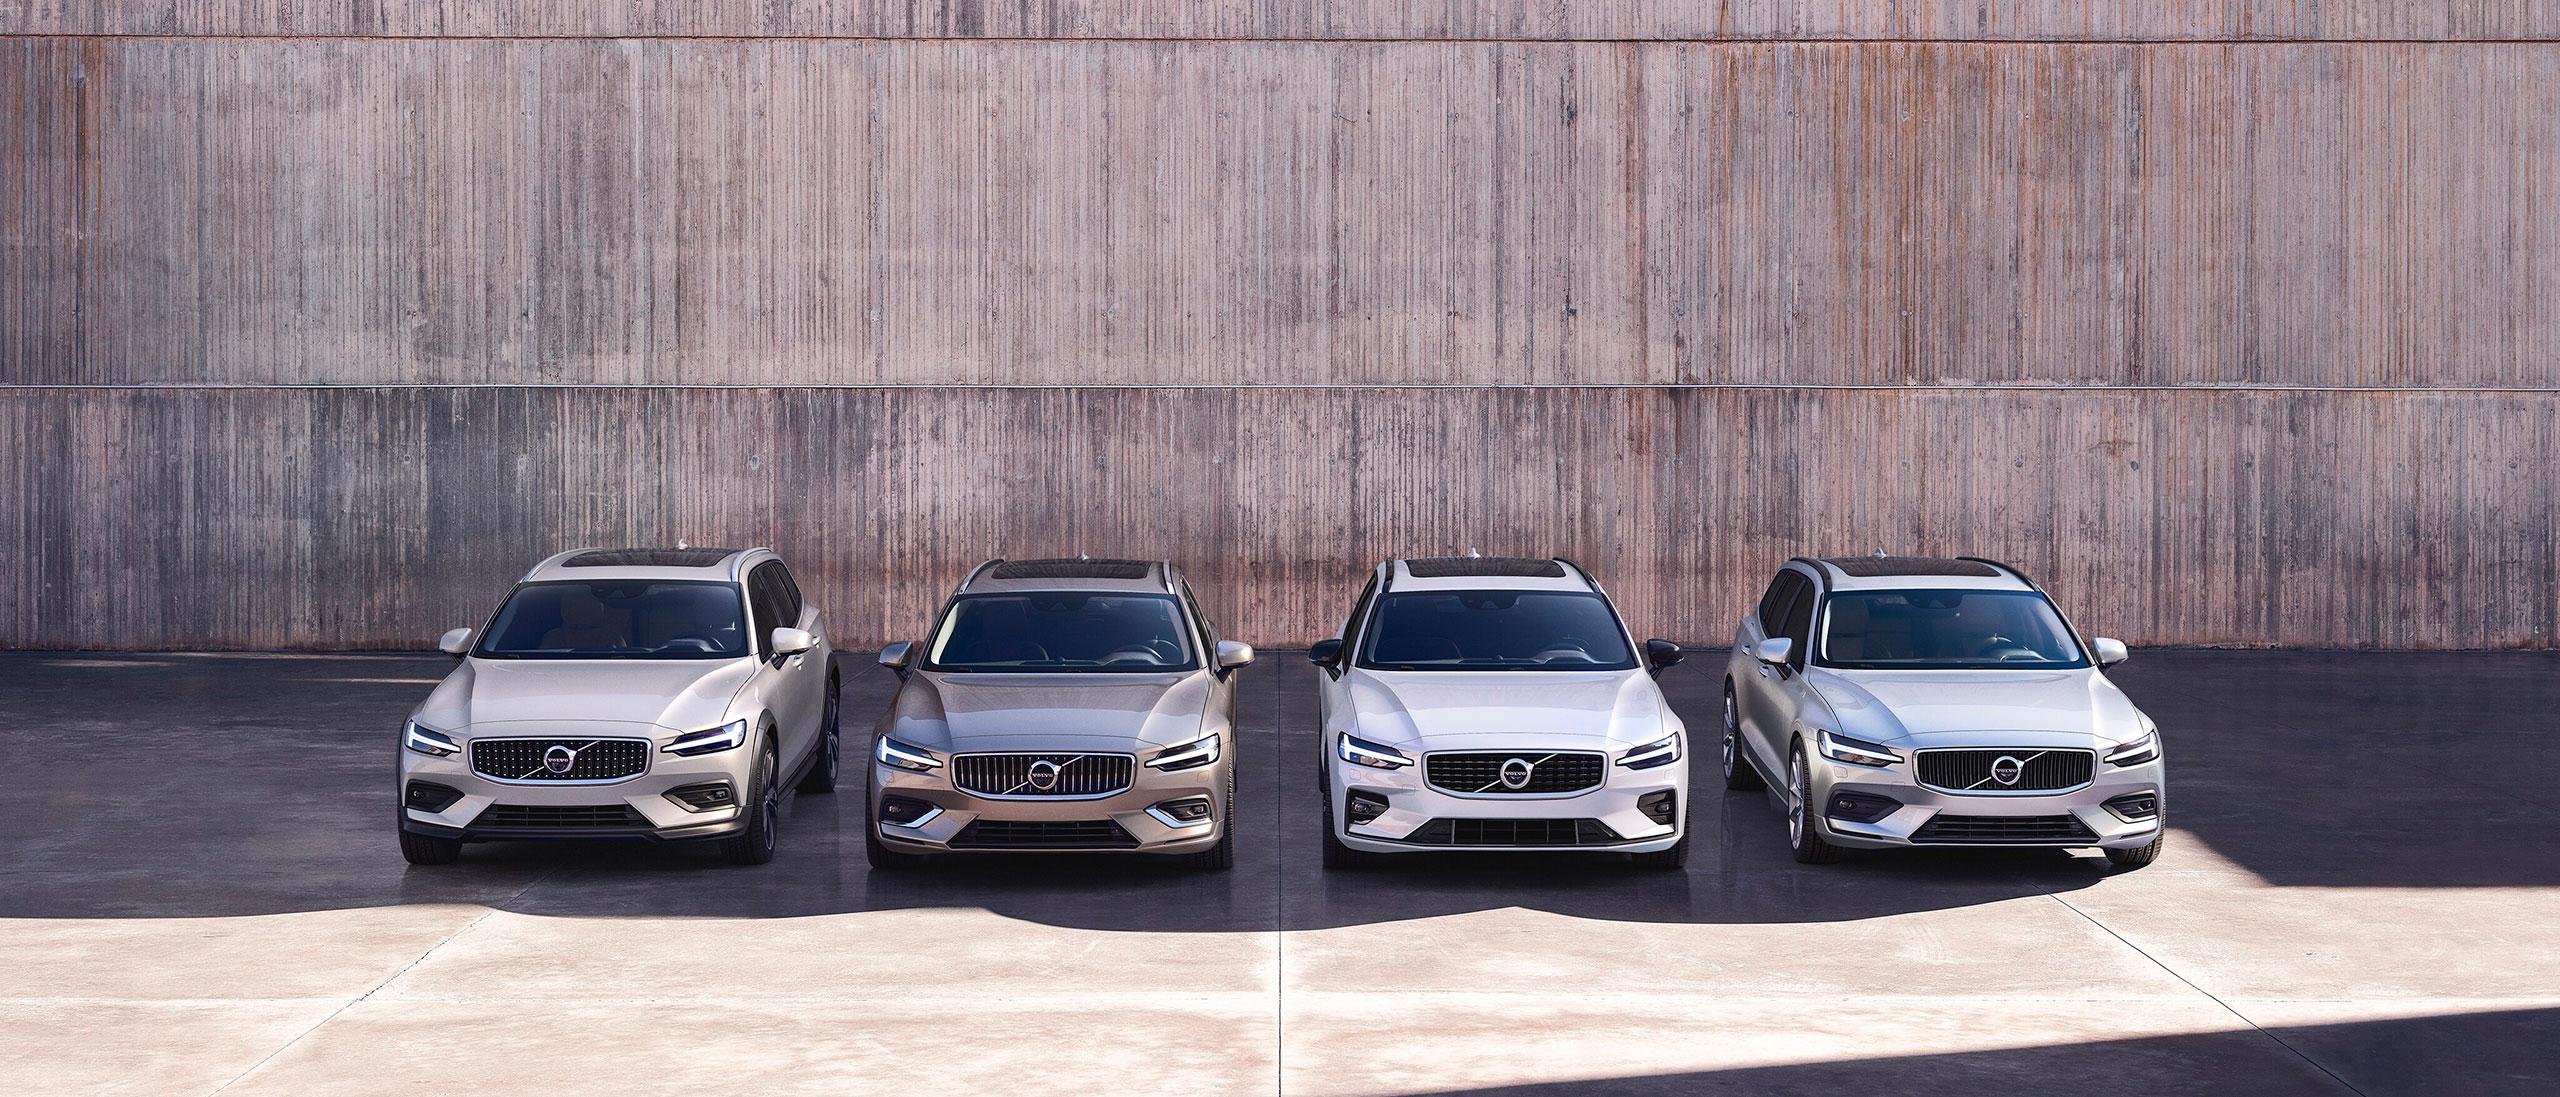 Volvo biler foran en mur